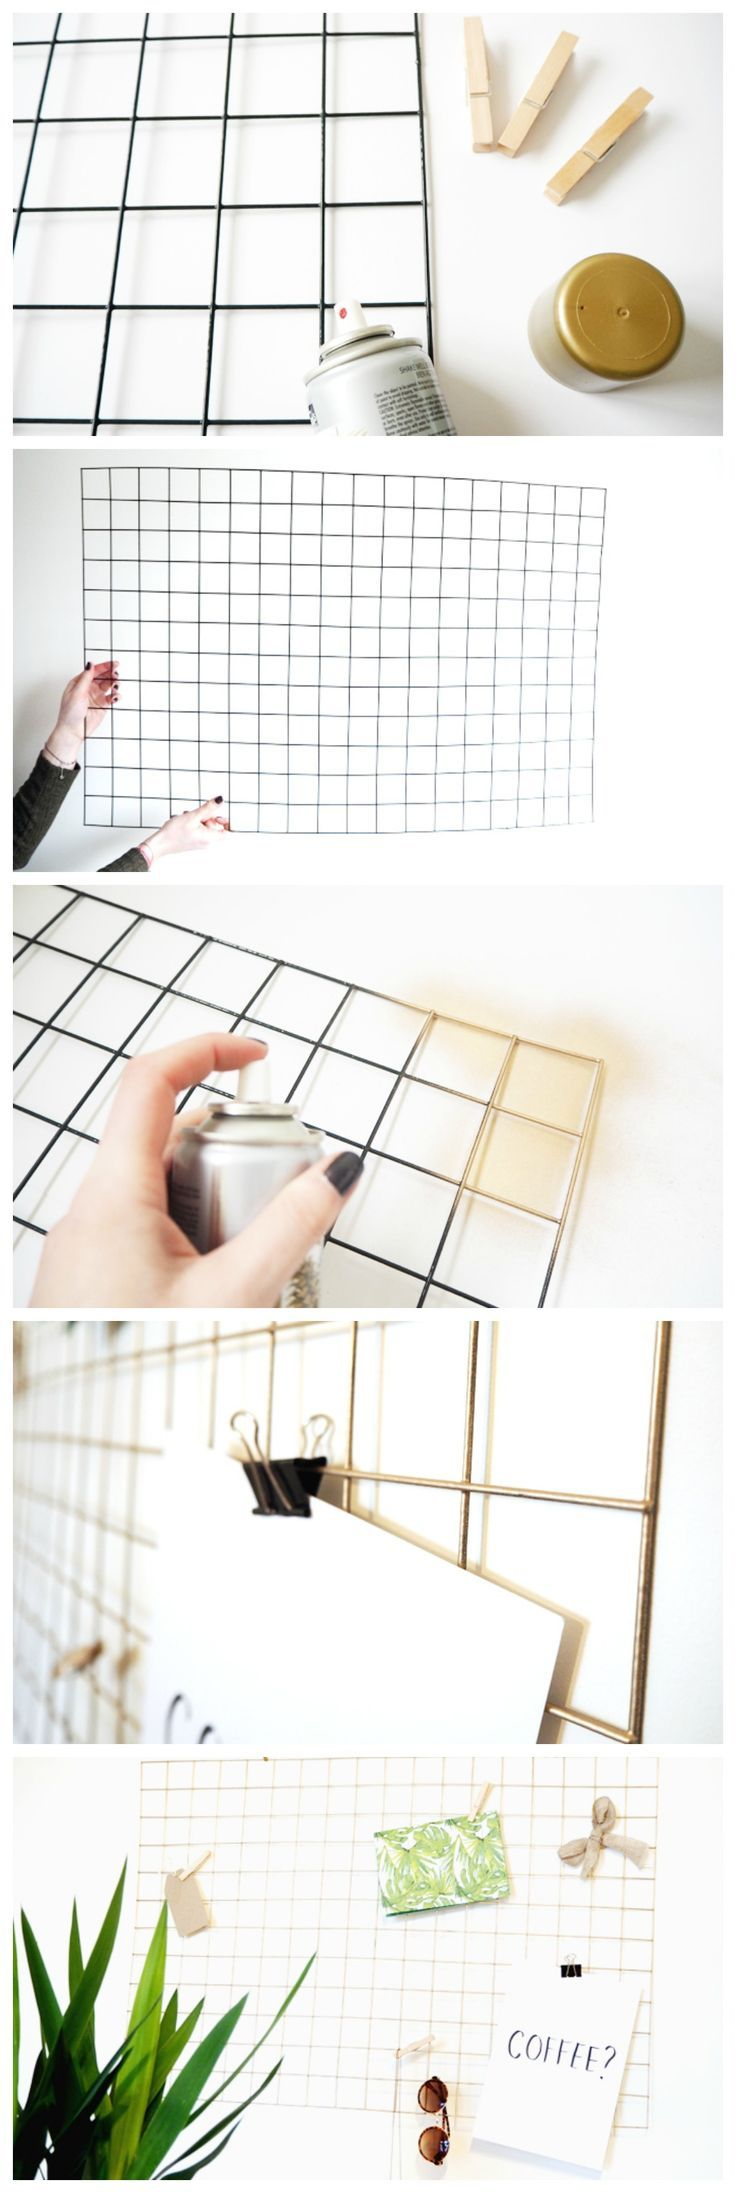 best house decoration ideas images on Pinterest Bathroom